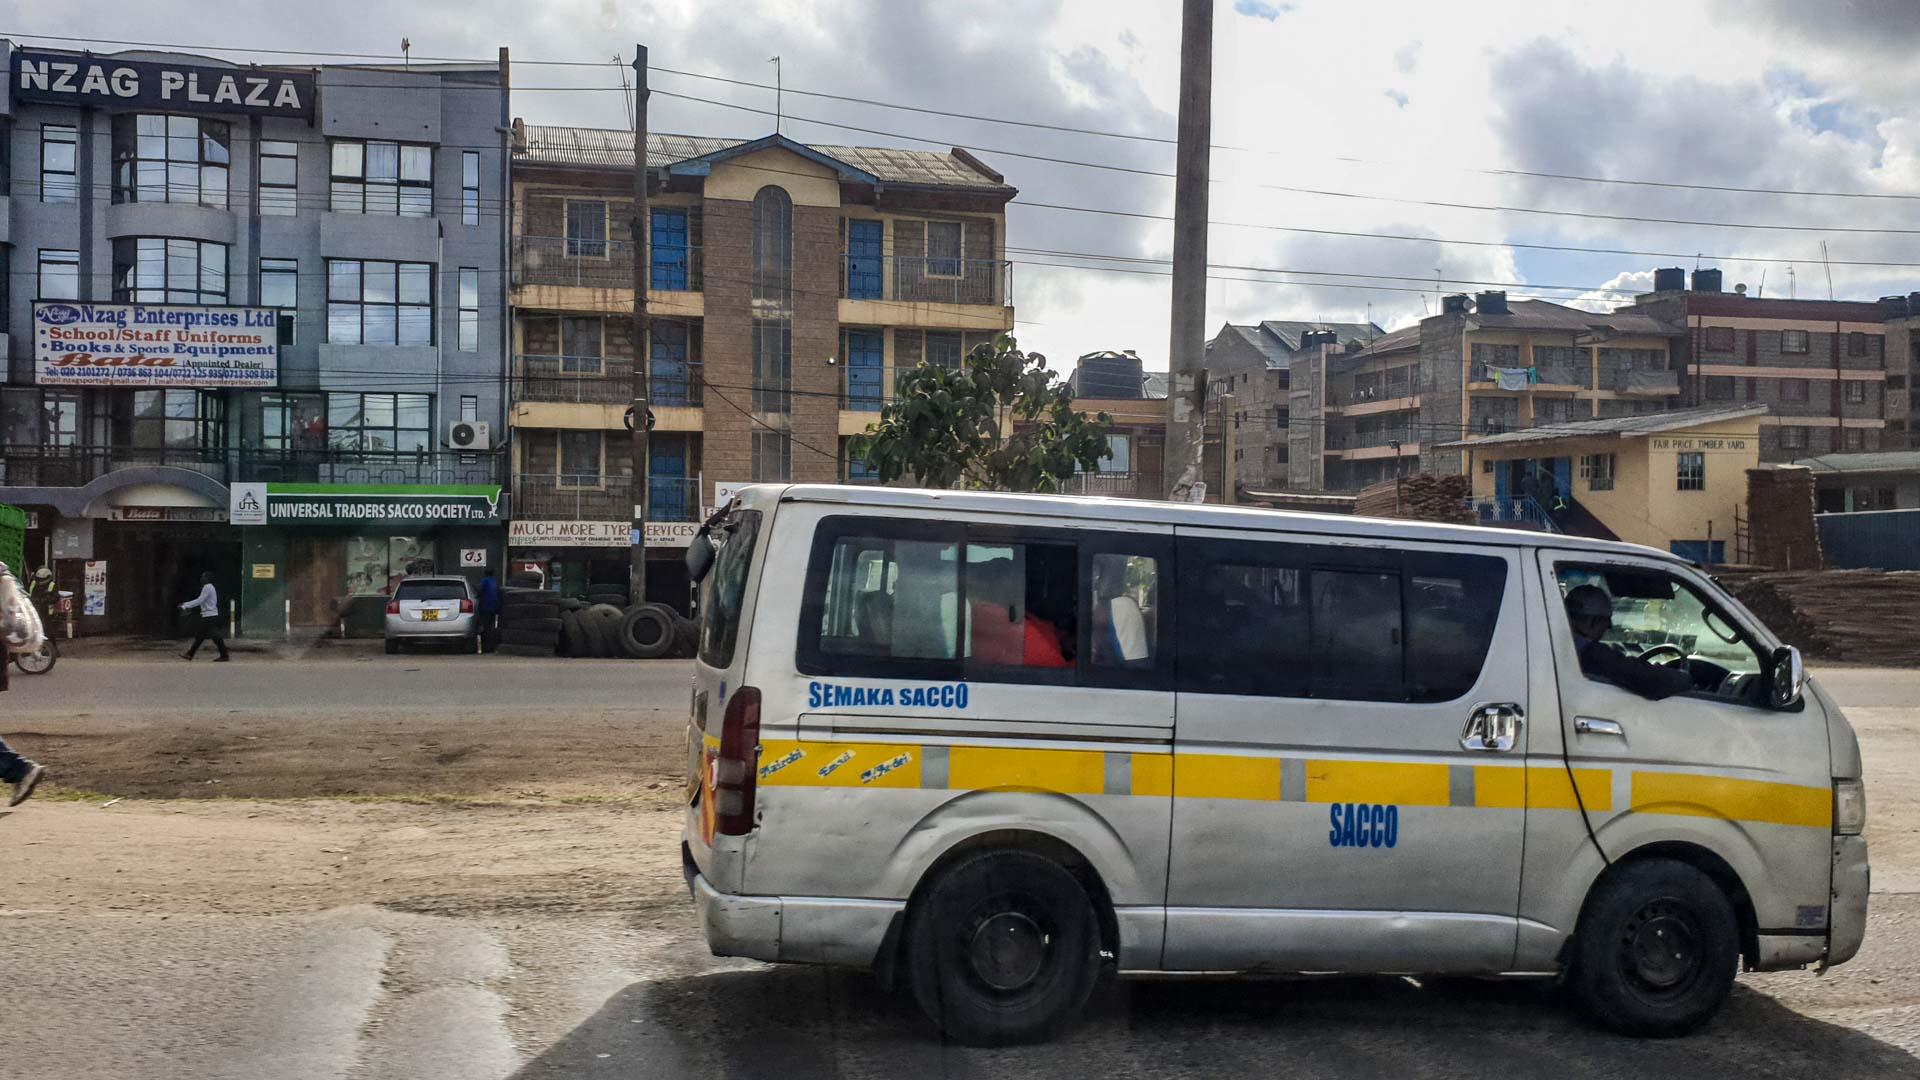 Matatu (autobús) a las afueras de Nairobi, Kenia